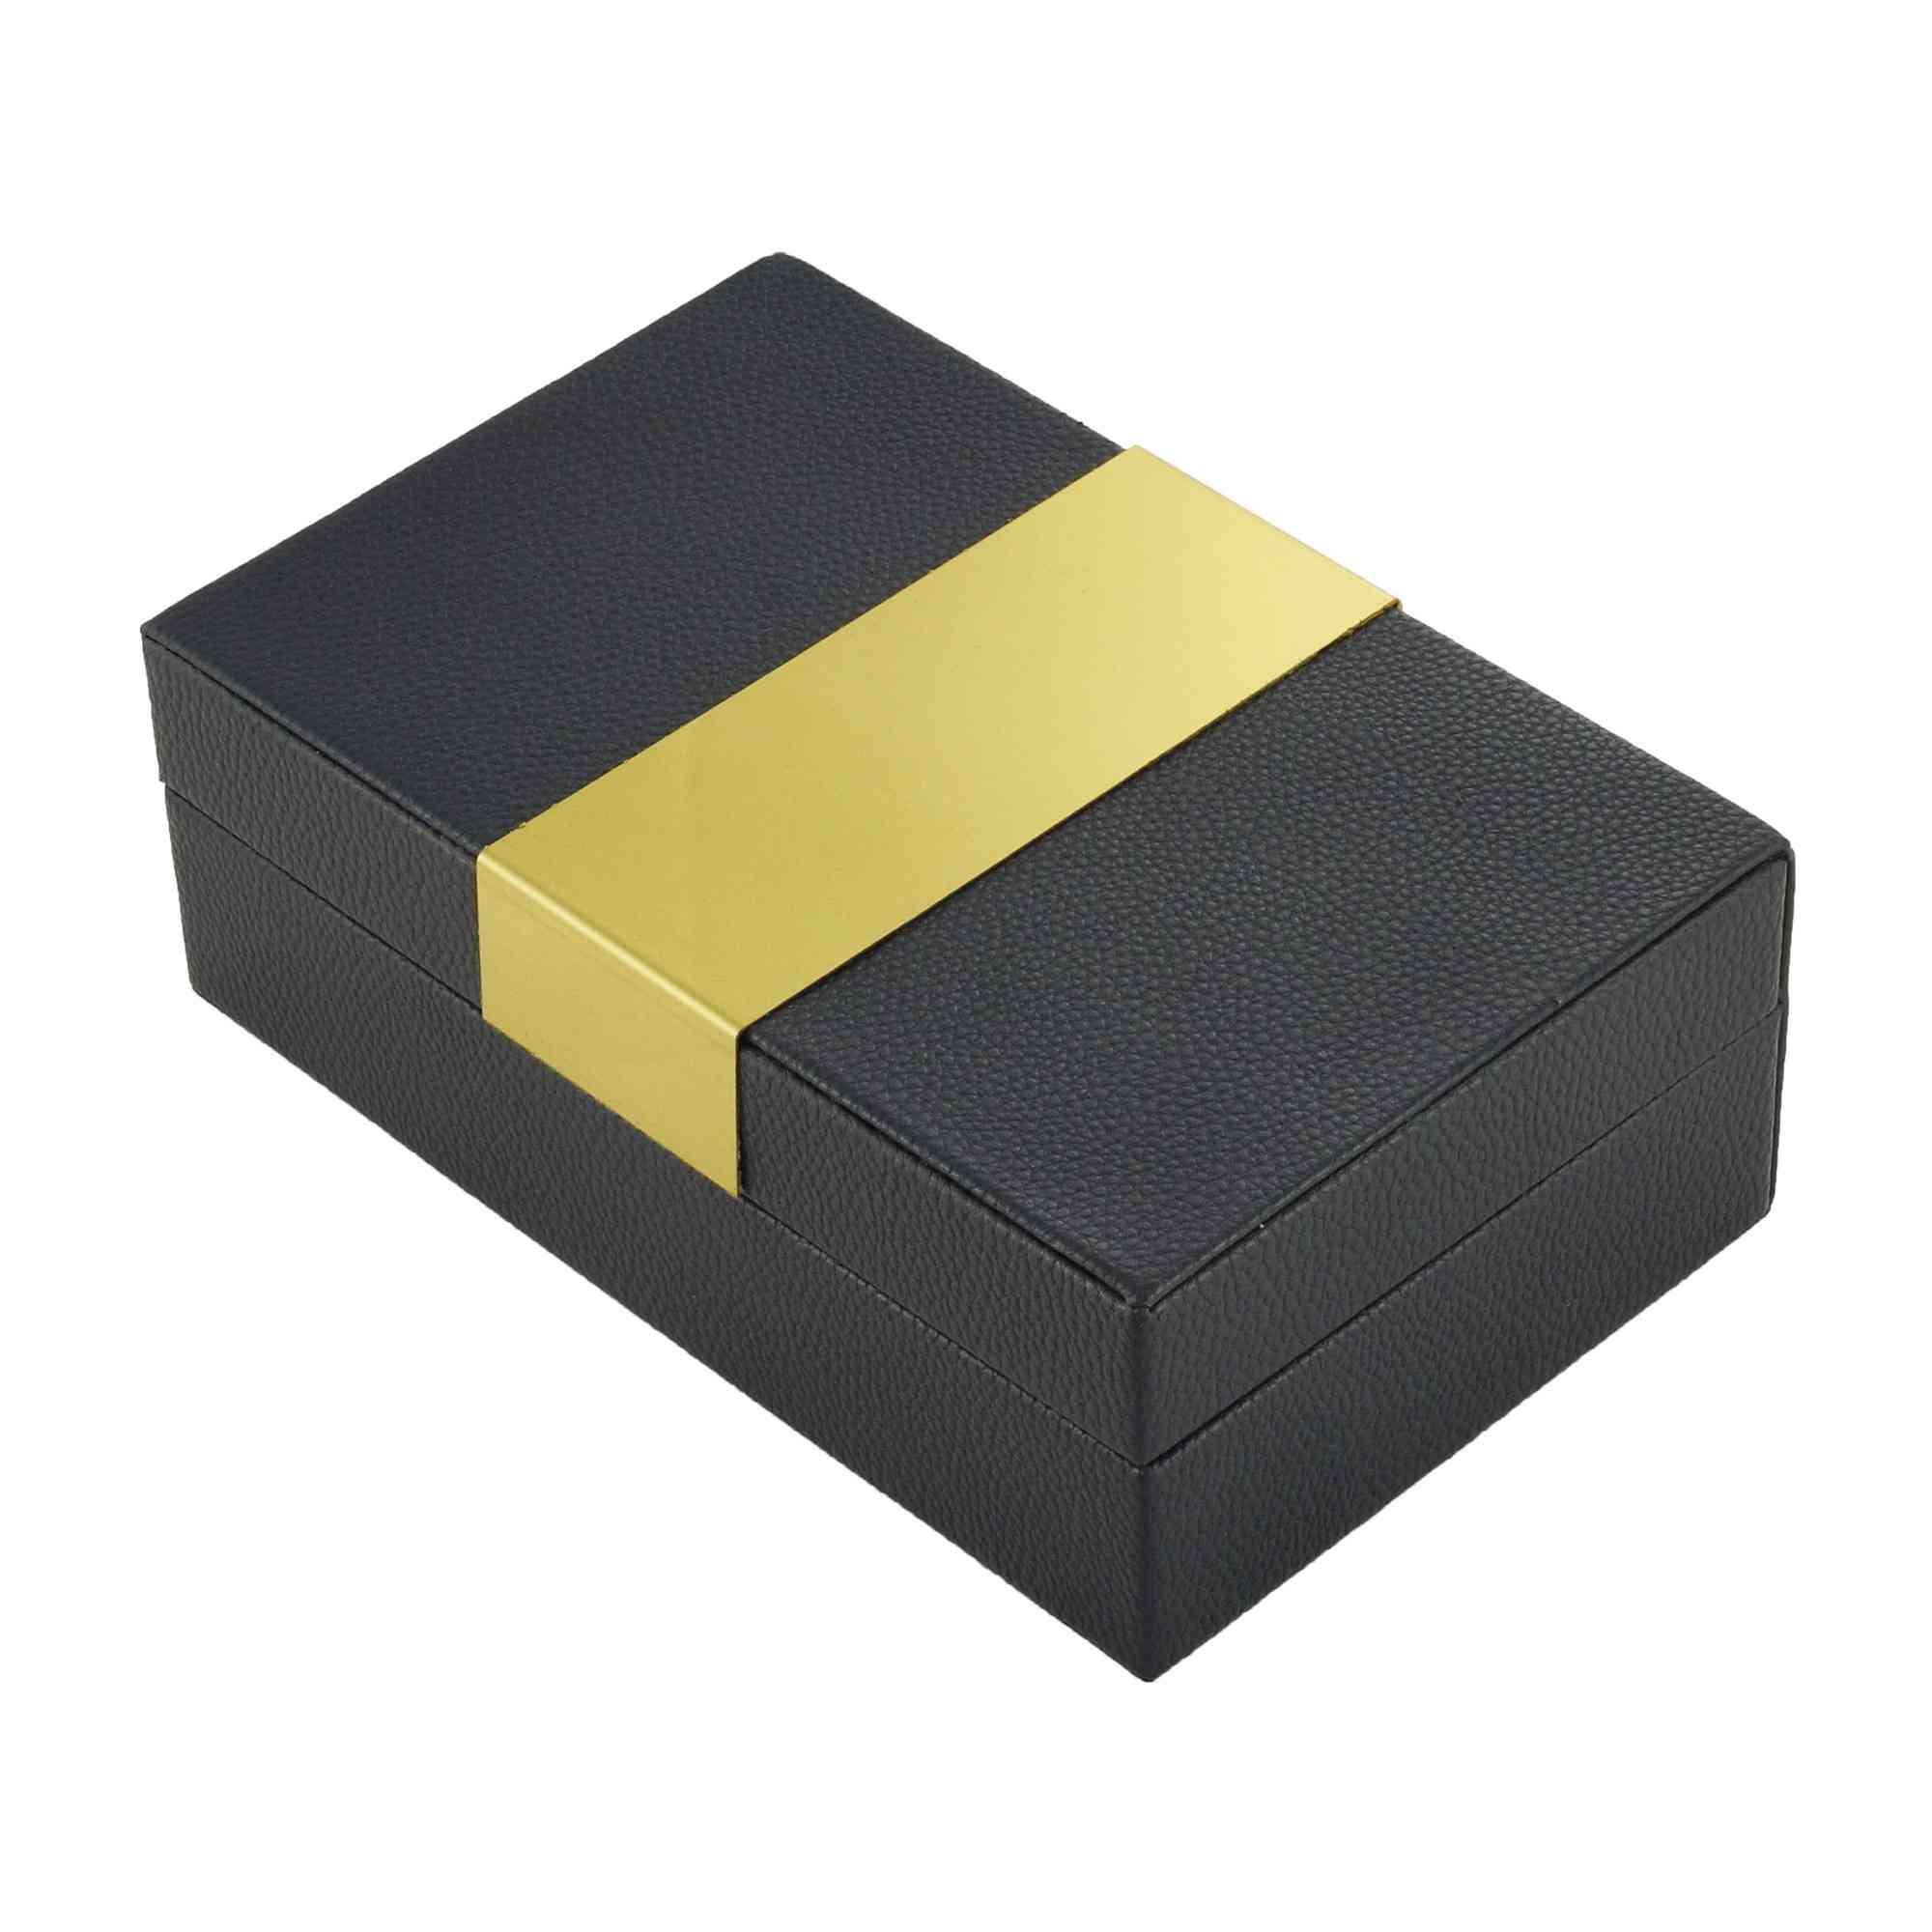 Caixa Decorativa de Corino Azul